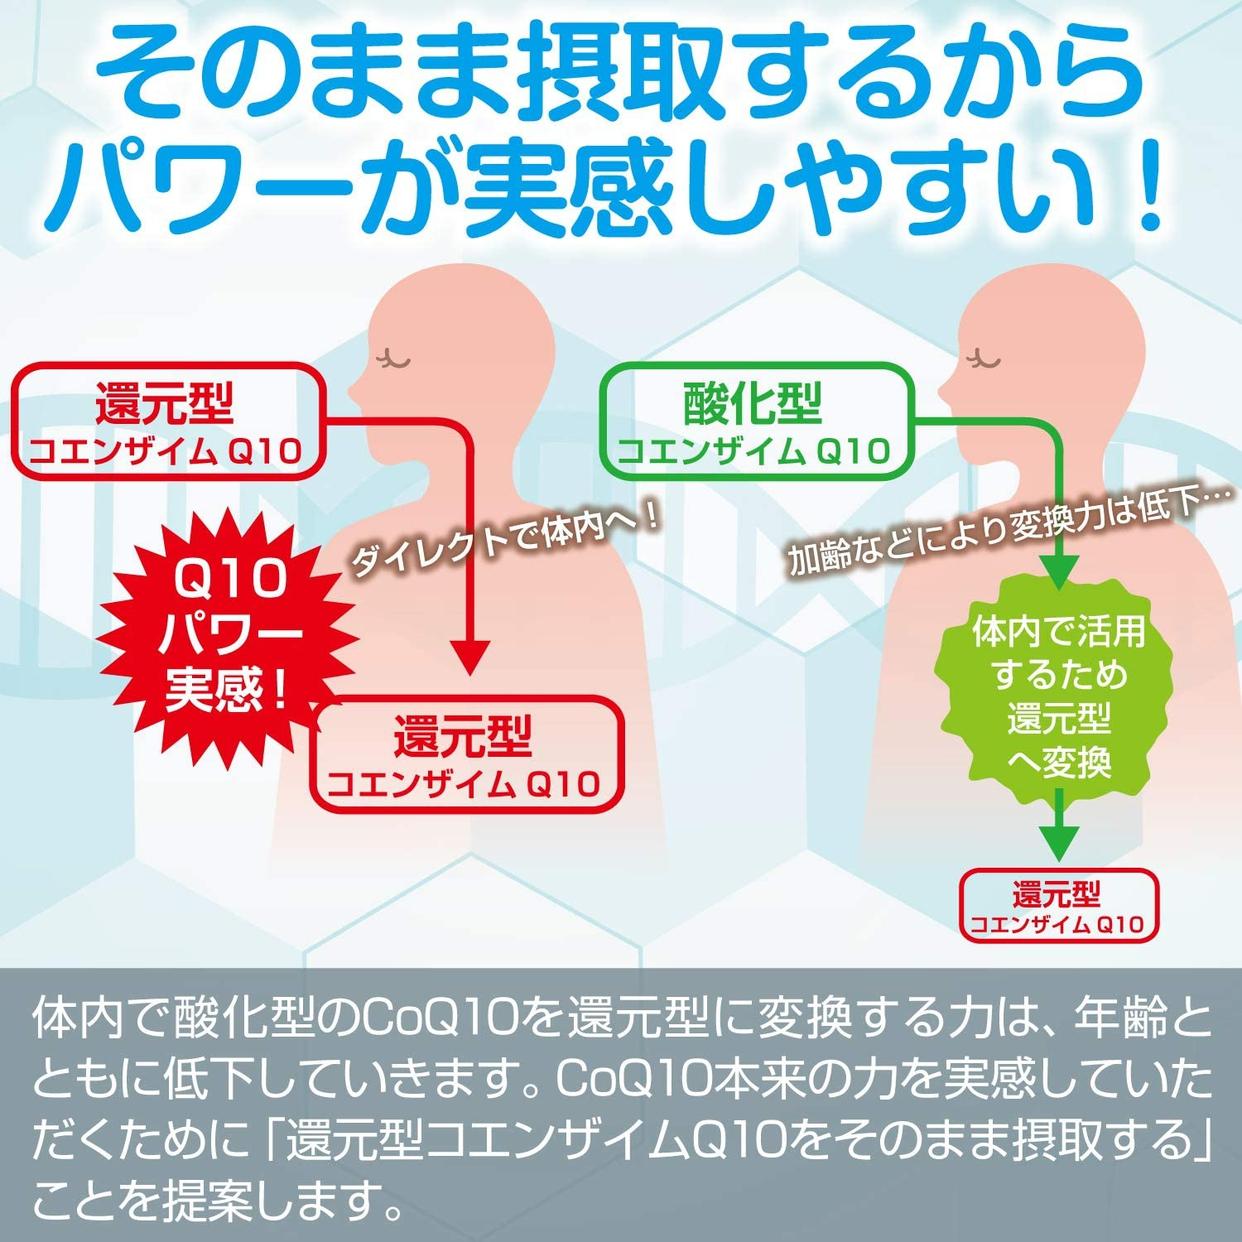 APRENDERS(アプレンダーズ) 還元型コエンザイムQ10の商品画像5